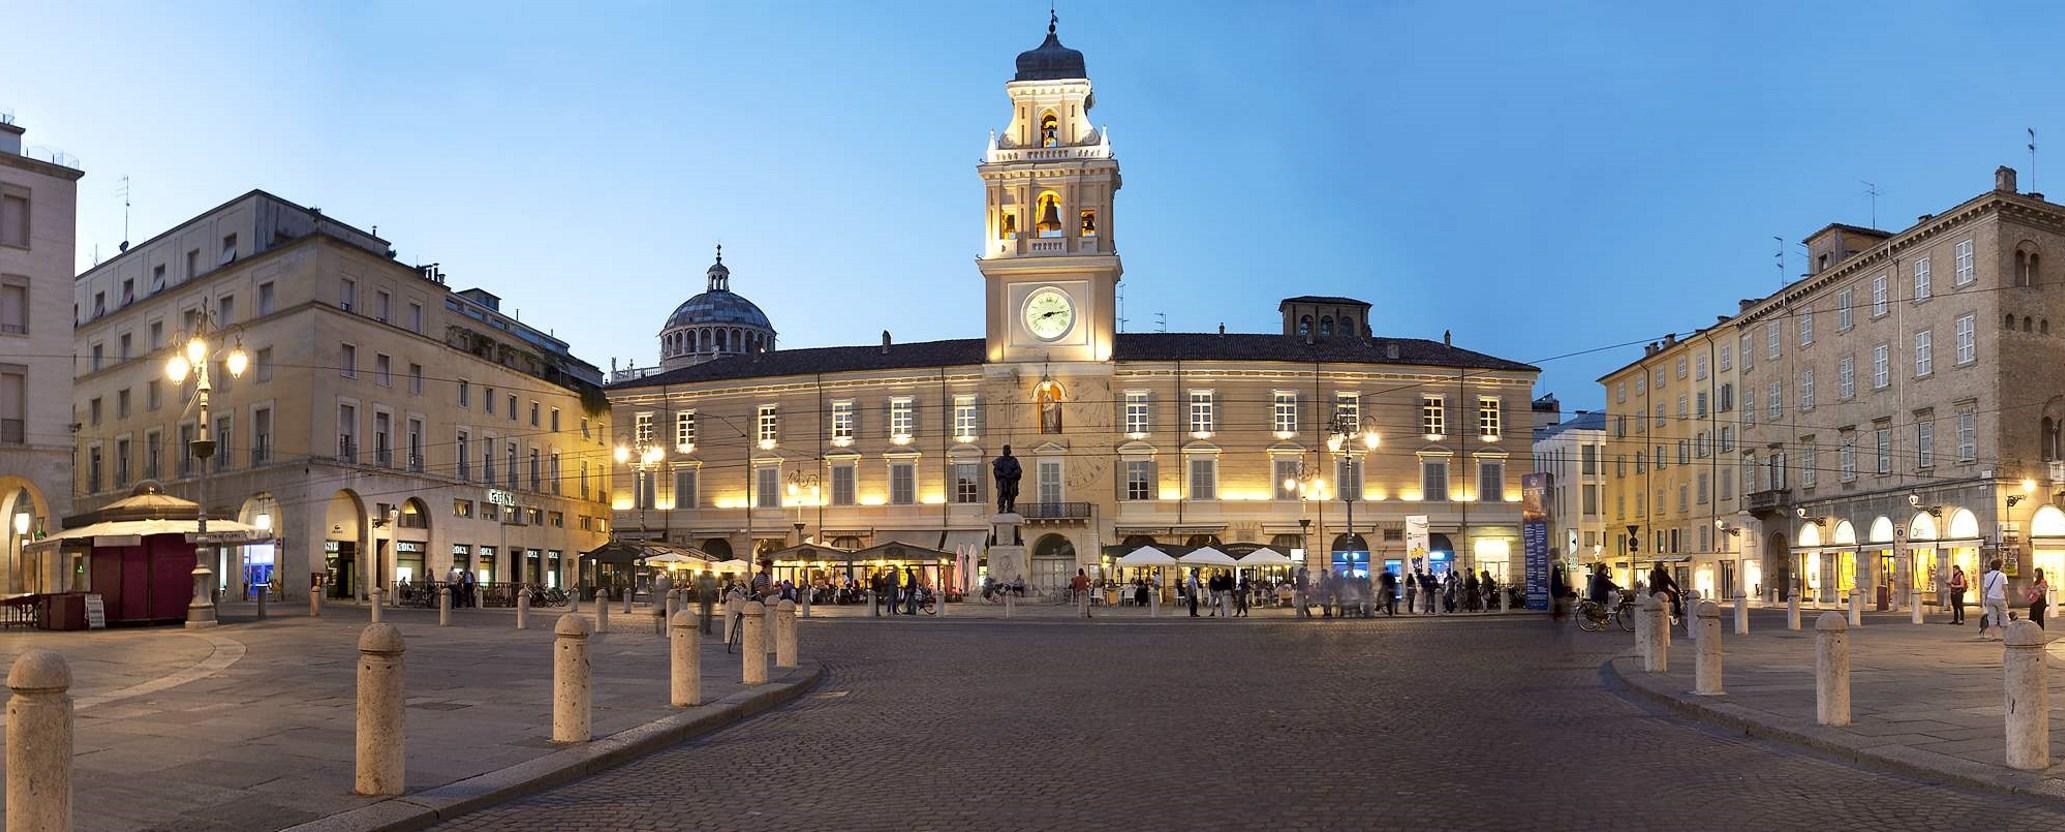 Dormire in Hotel a Parma con.. visita gratis ai Musei di Parma